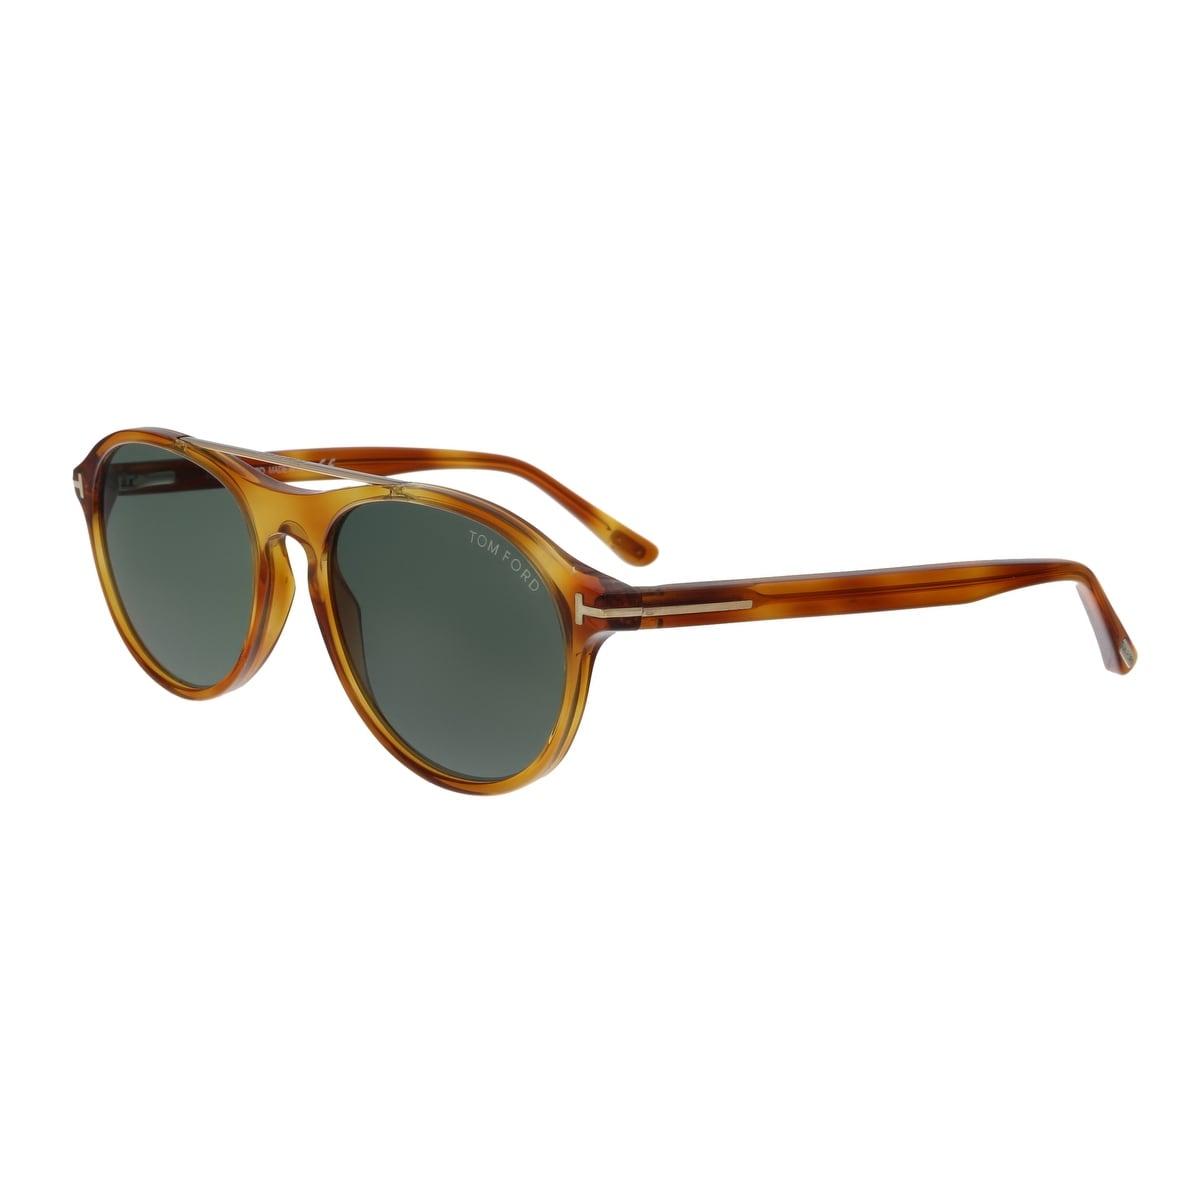 4102a874f84e Tom Ford FT0556 53N Cameron Blonde Havana Aviator Sunglasses - No Size. by  Tom Ford